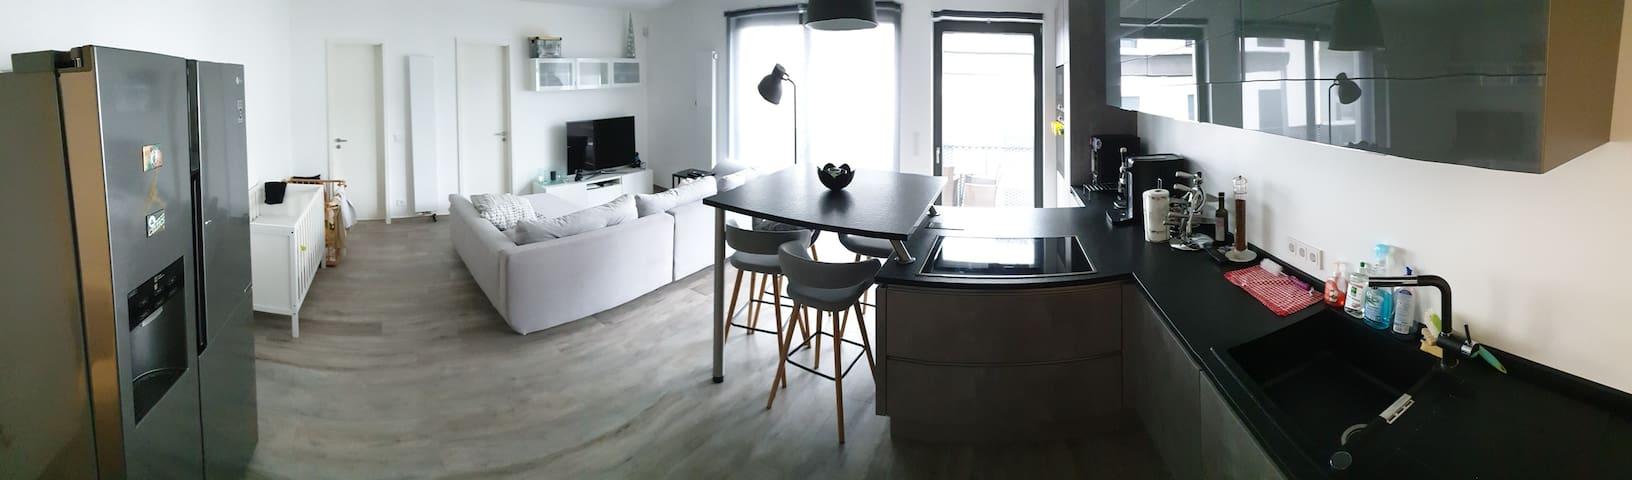 appartement moderne et de haut standing